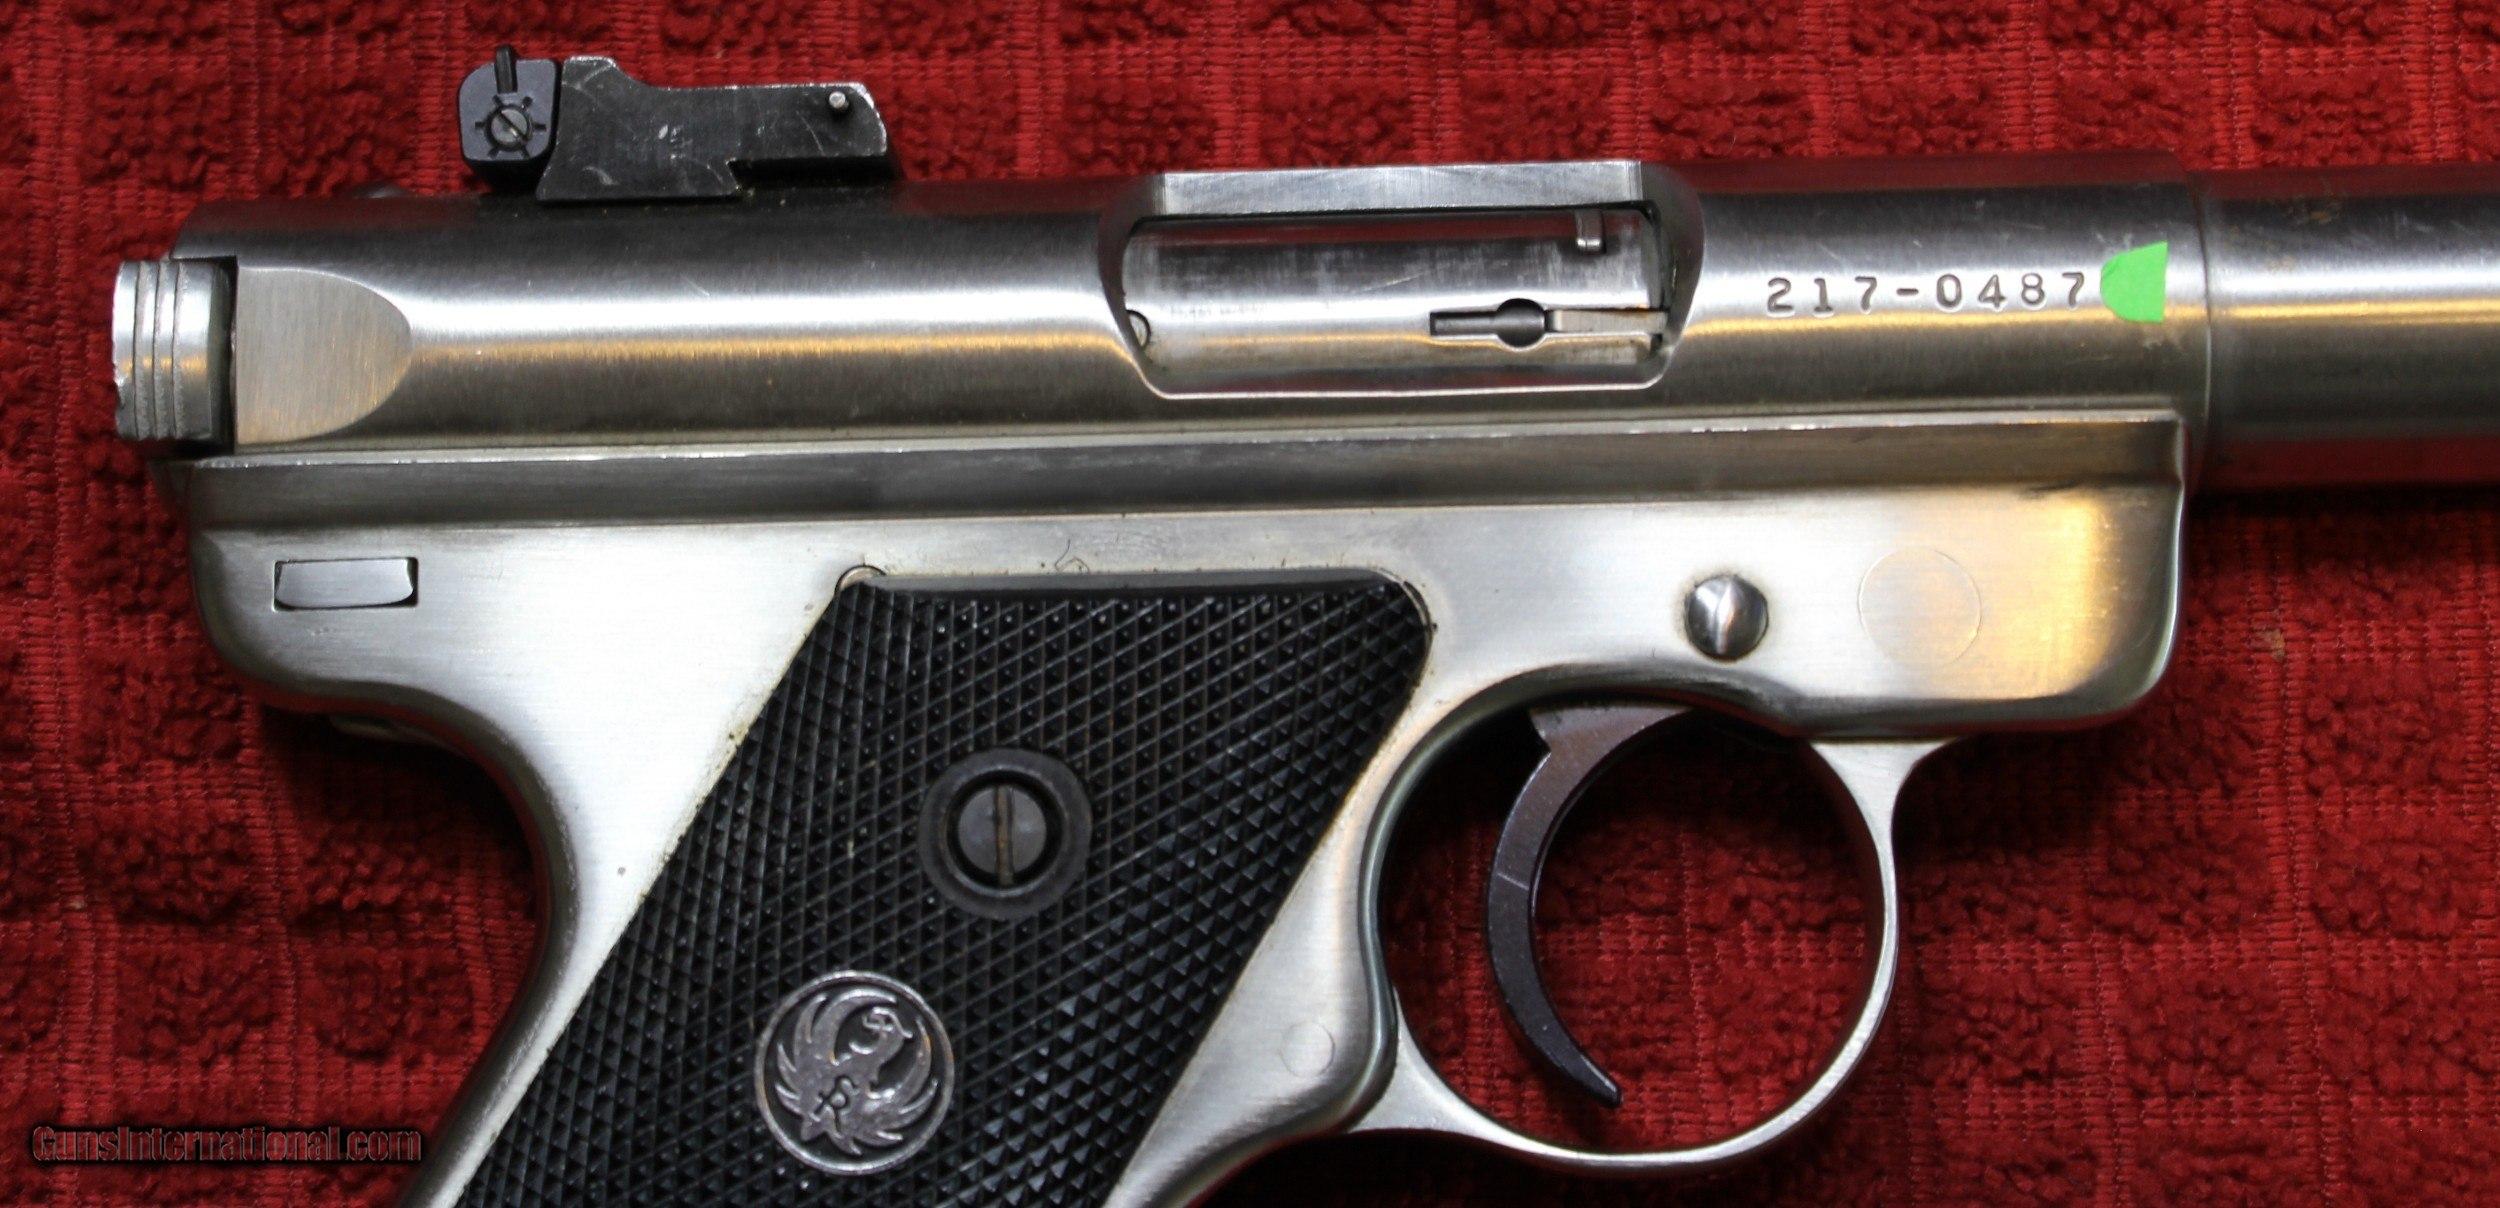 Ruger Mkii Target 22lr Caliber Pistol Stainless Target